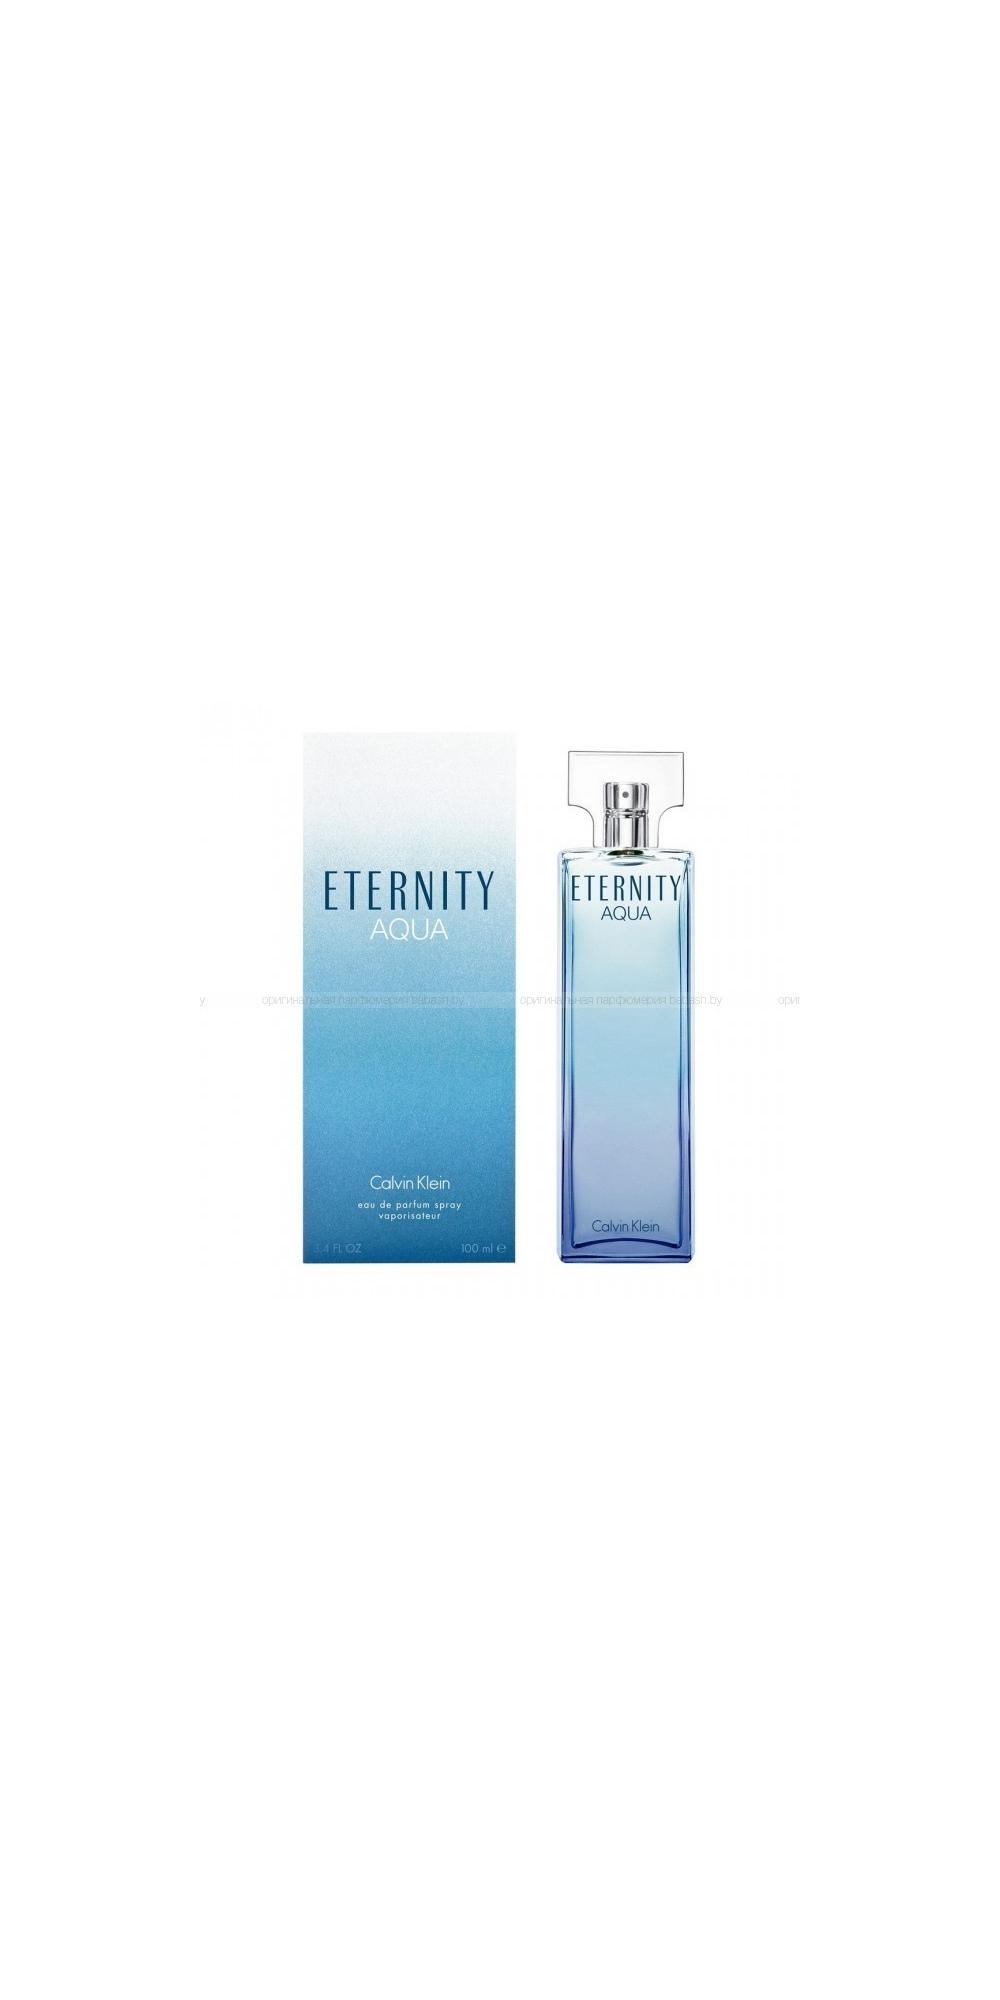 Calvin Klein Eternity Aqua For Women духи купить туалетную воду